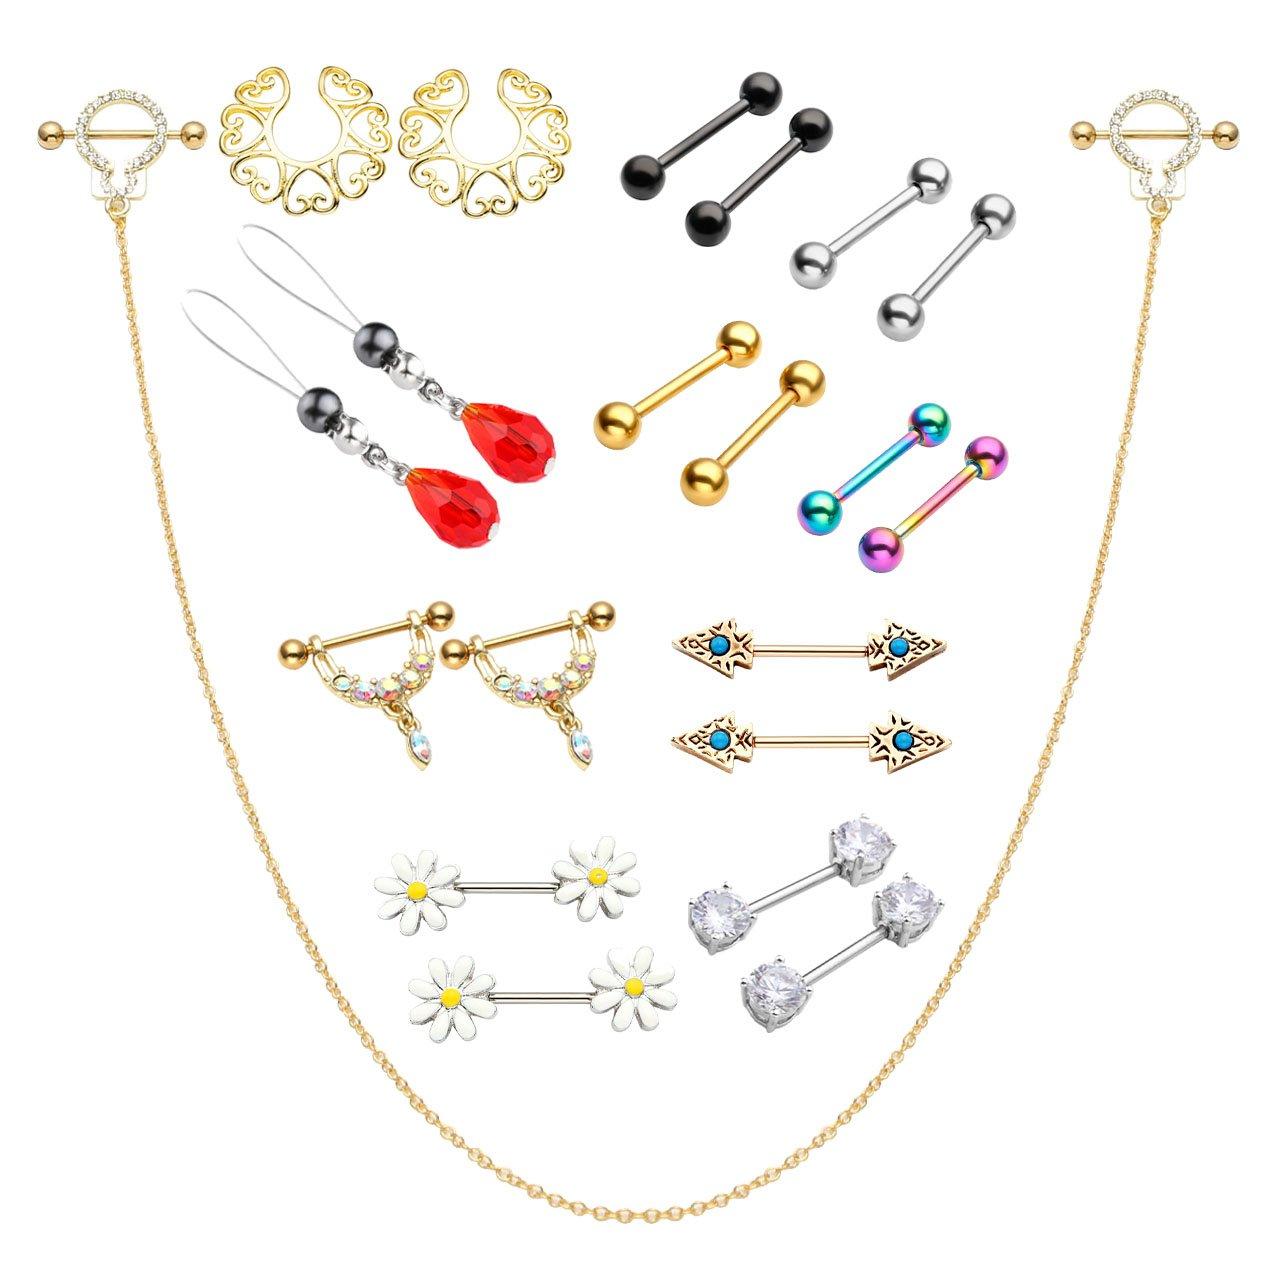 BOPREINA 12/21/27/30Pcs 14G Nipple Rings Body Piercing kit Barbell Crystal CZ Nipple Shield Classical Bar Rings in a Organizer Box